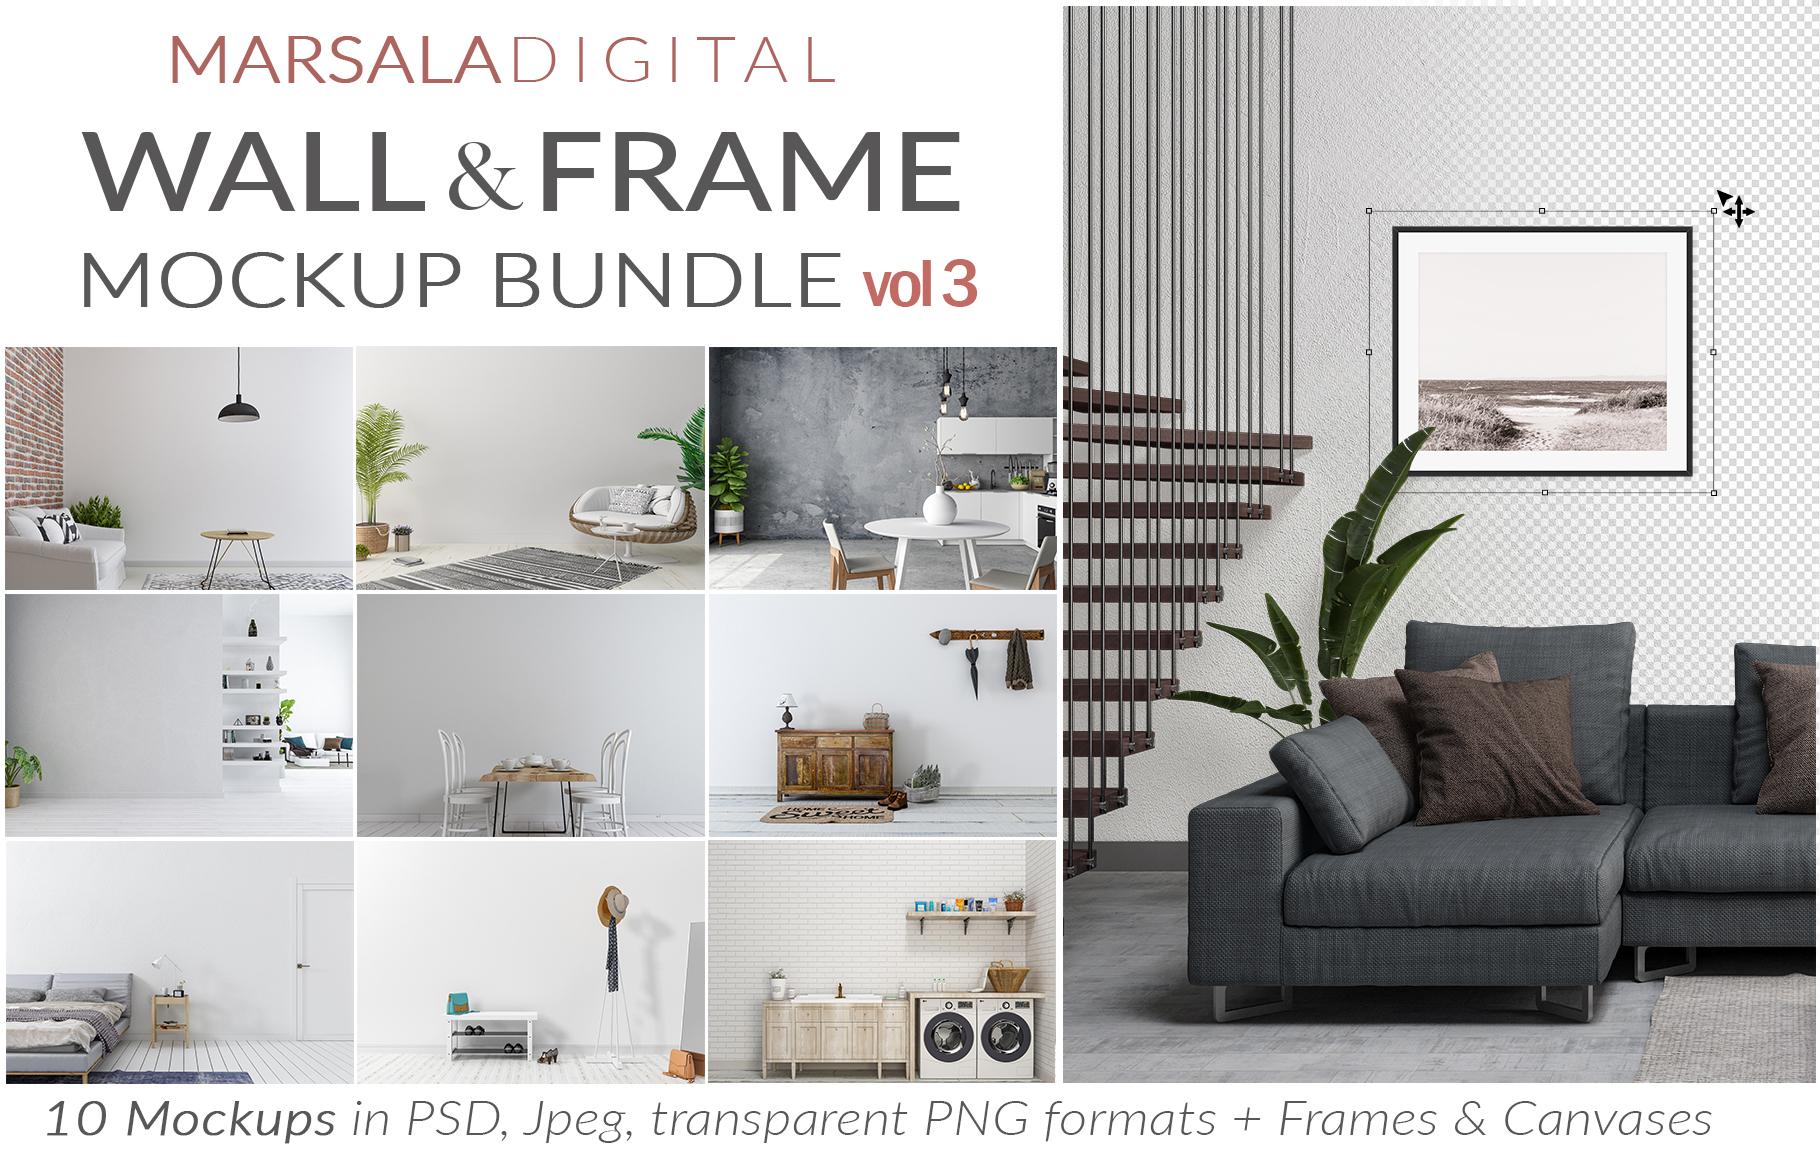 Massive Interior Wall Mockup, Frame Mockup Bundle FREE sampl example image 9